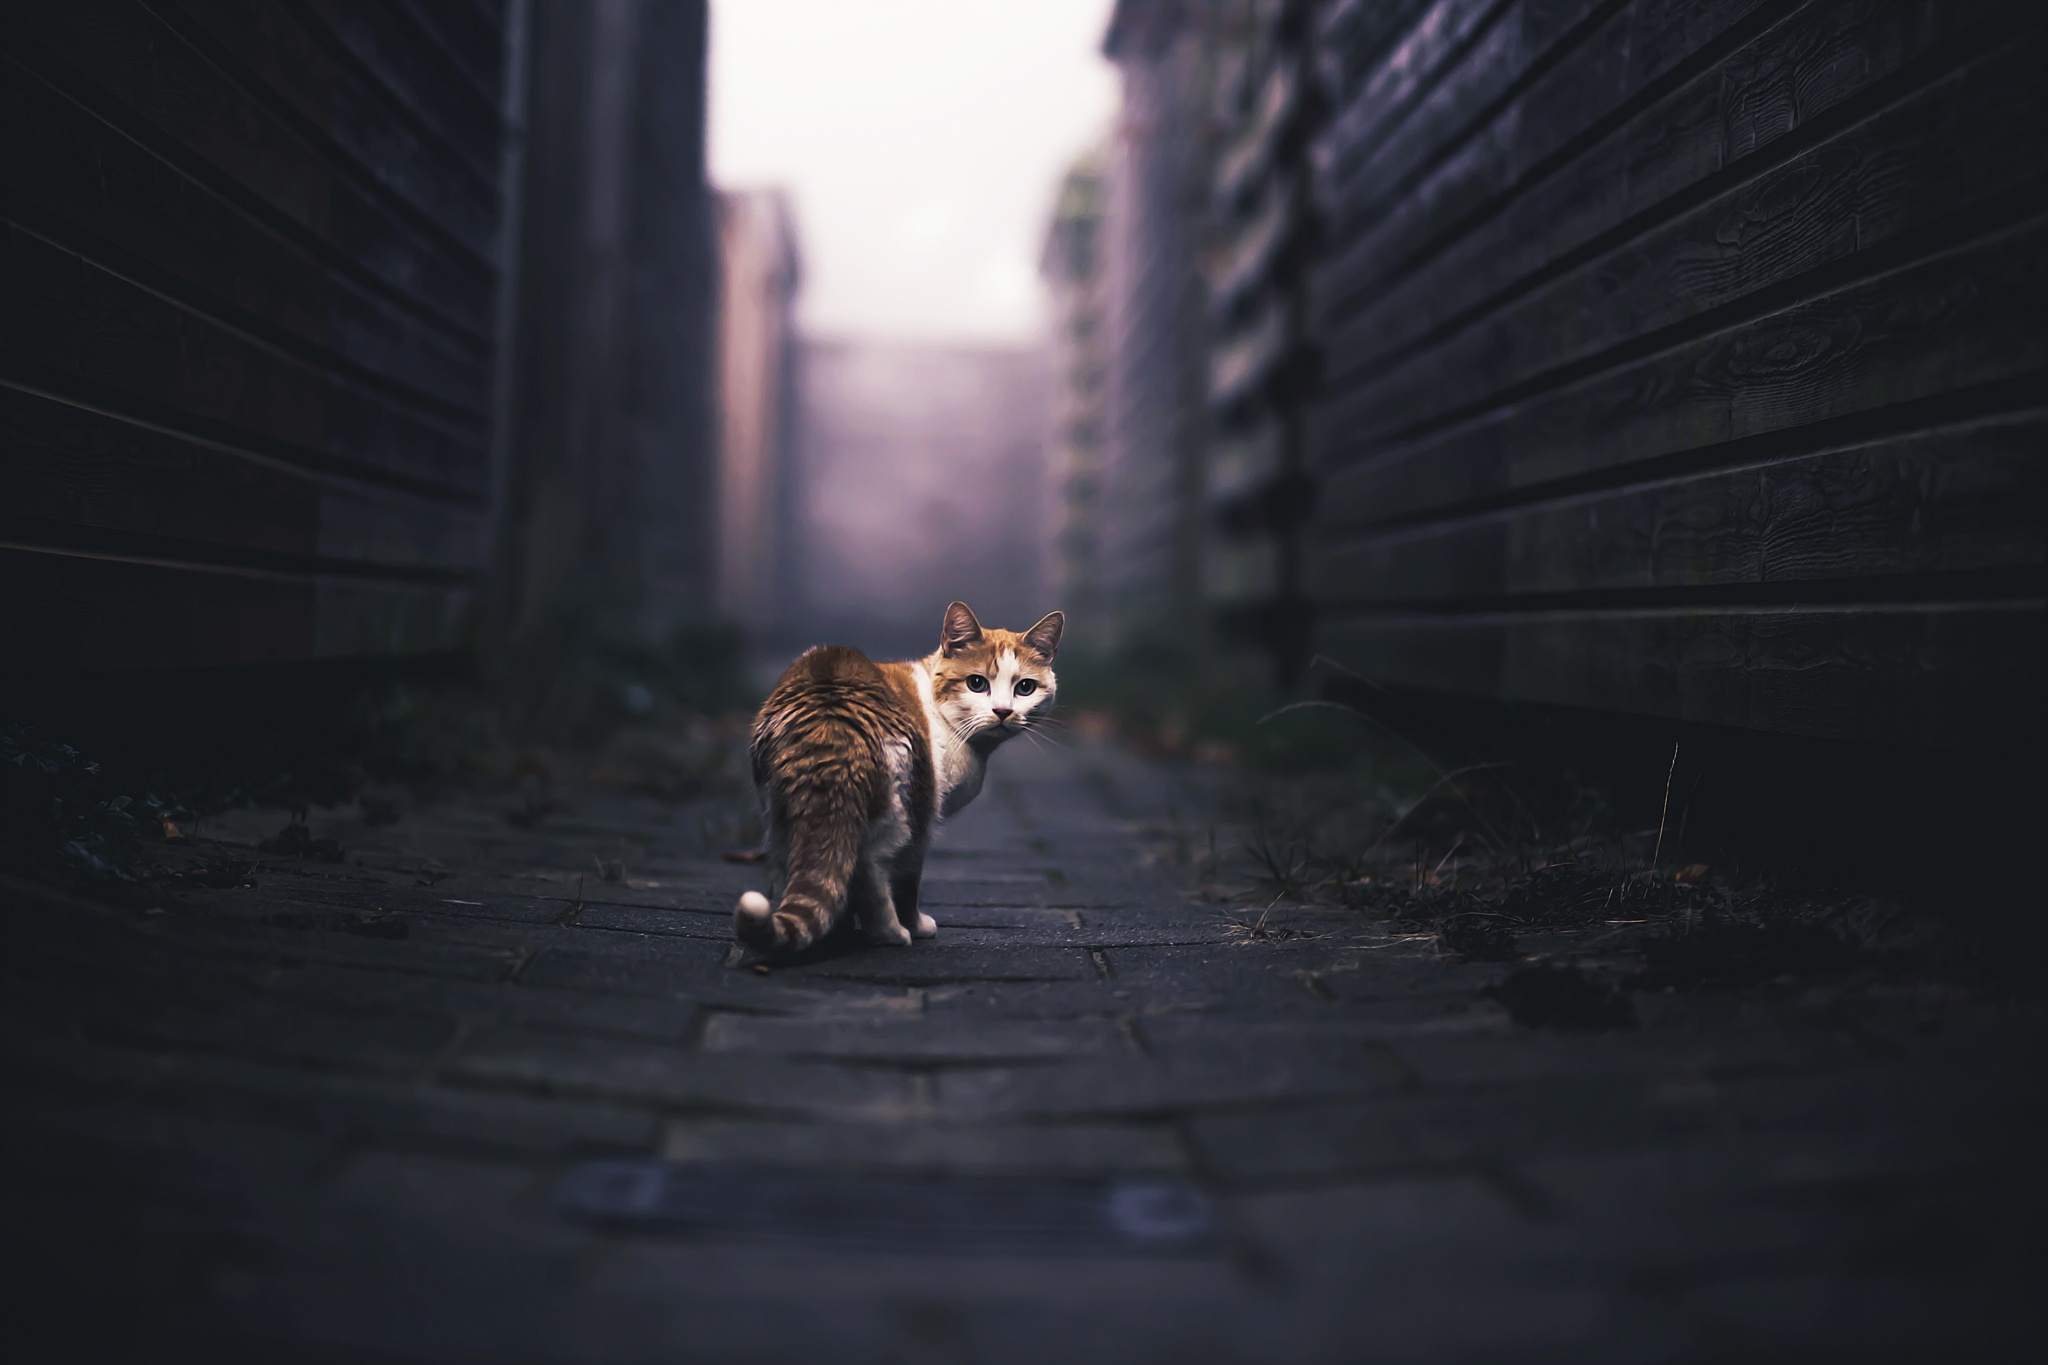 Foggy Alley by FelicityBerkleef